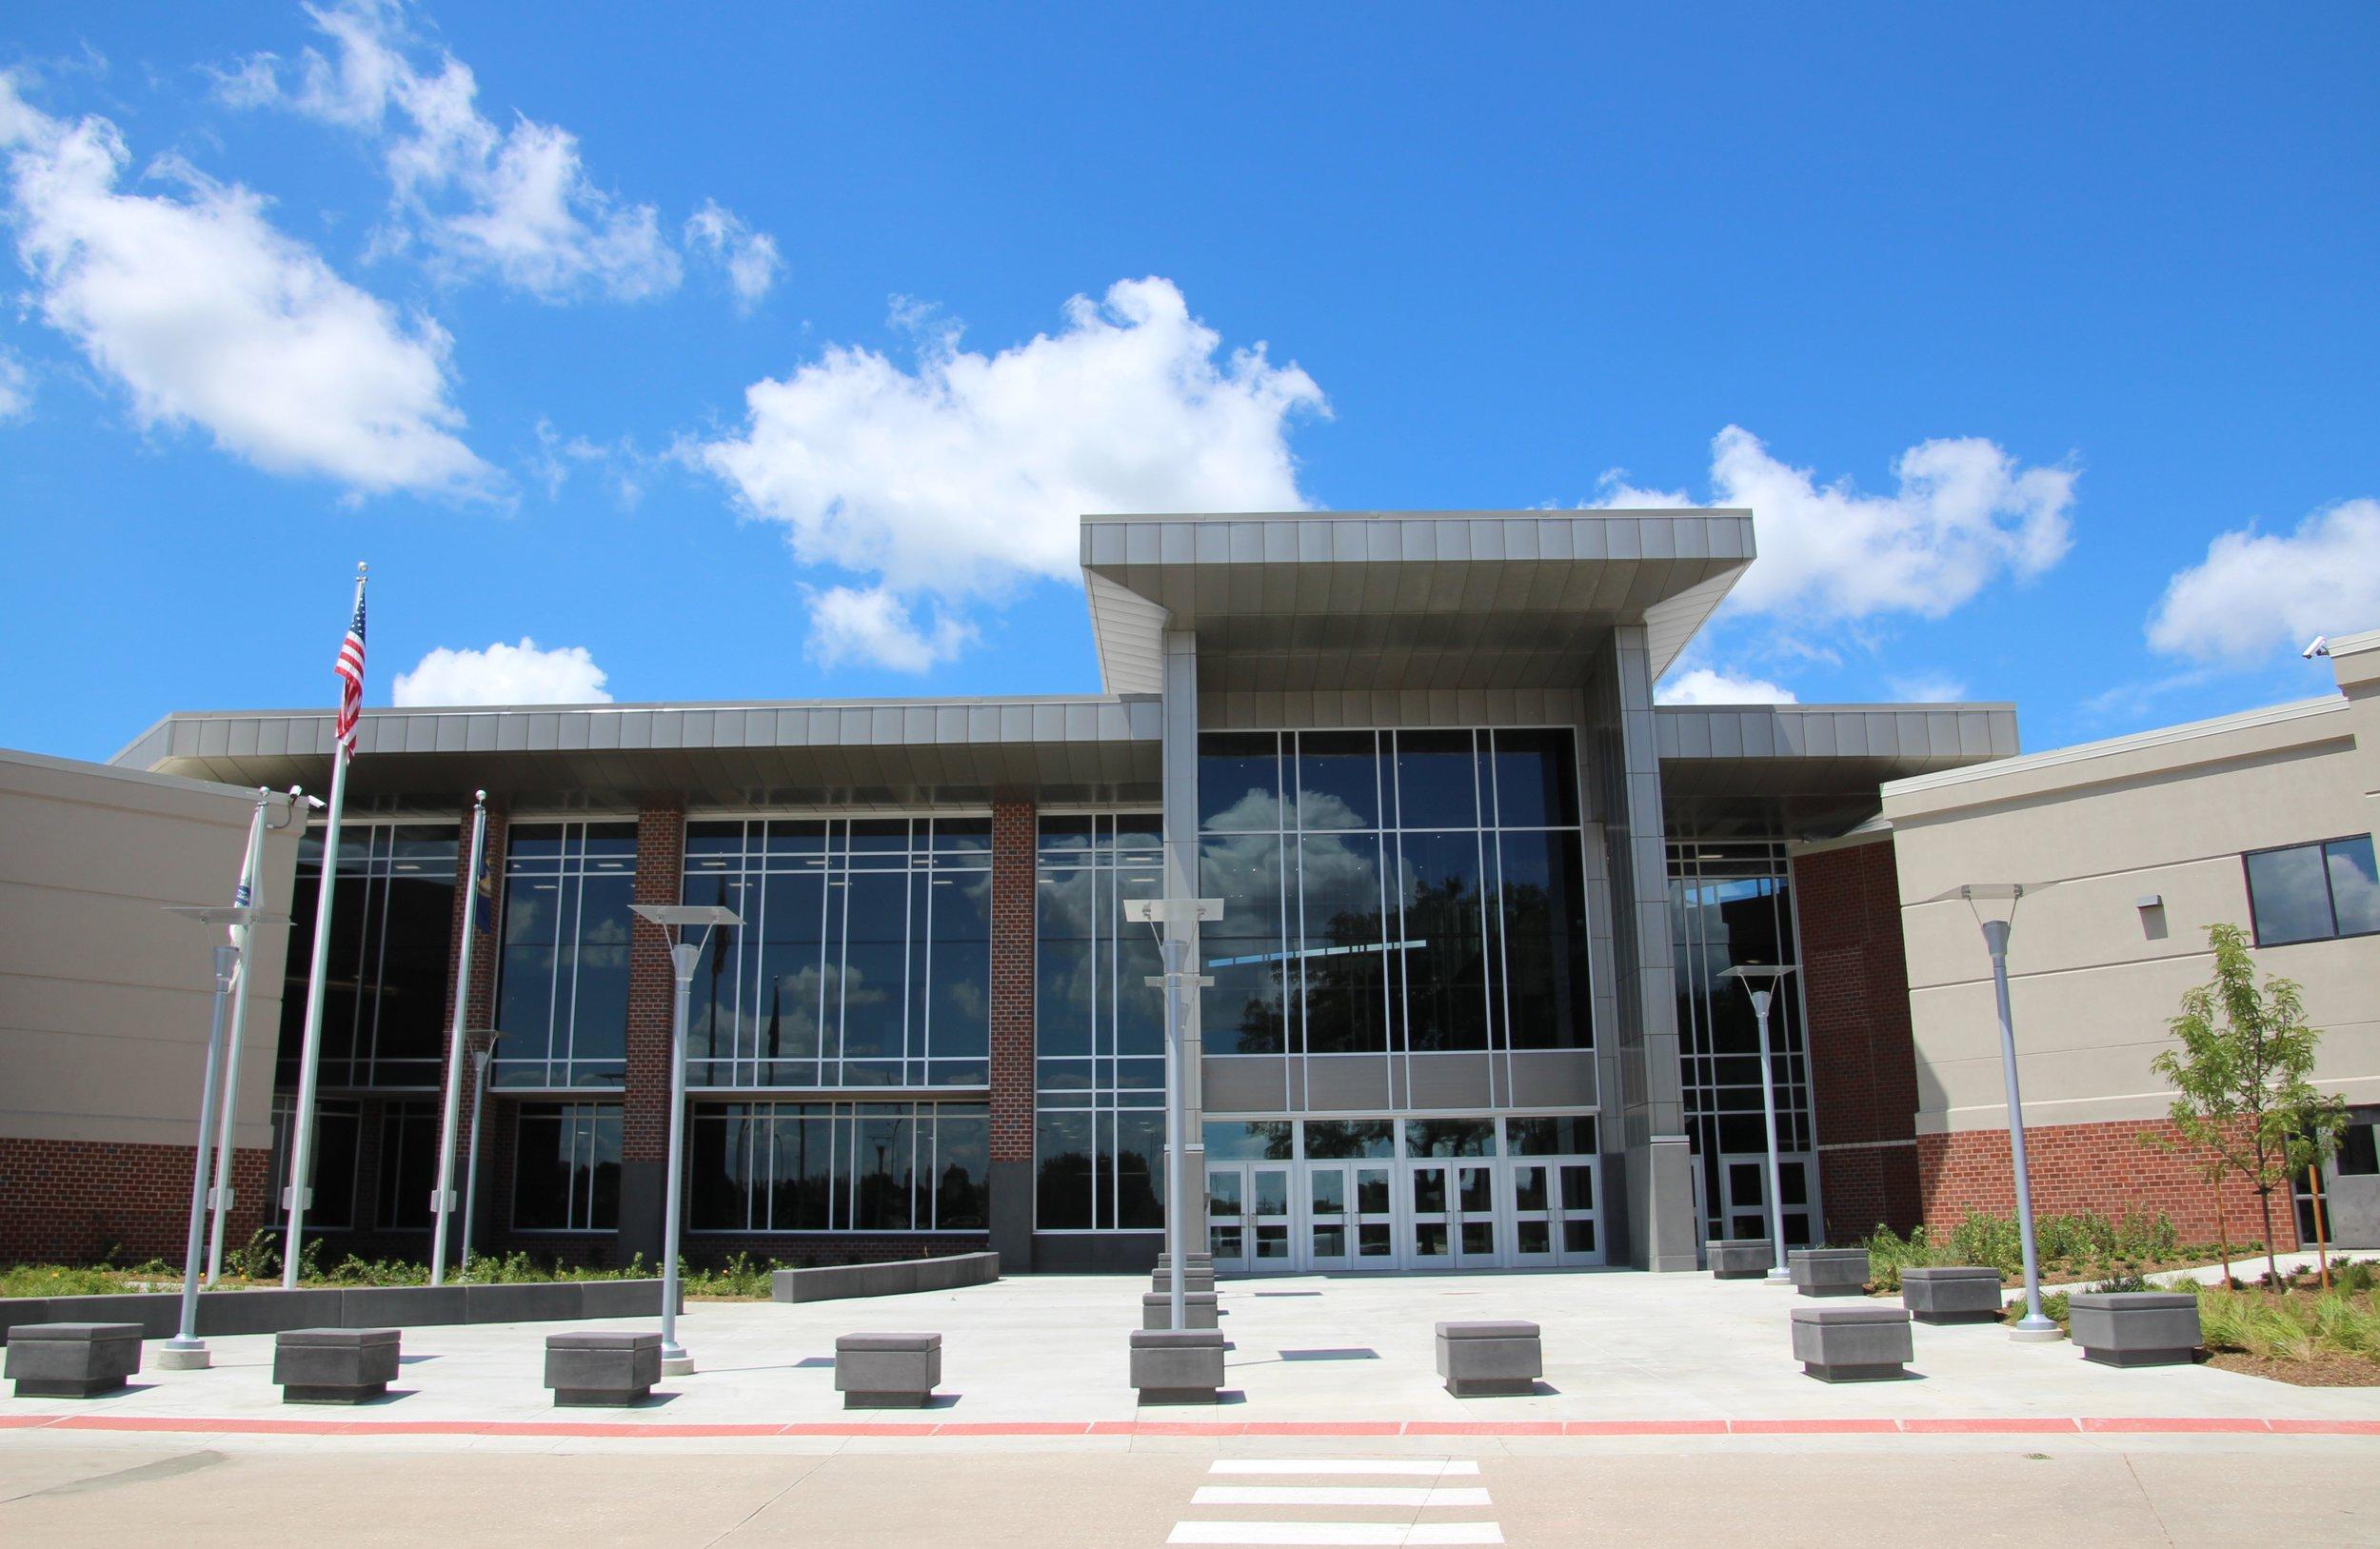 City Glass_Entrance_Millard North High School 4.jpg